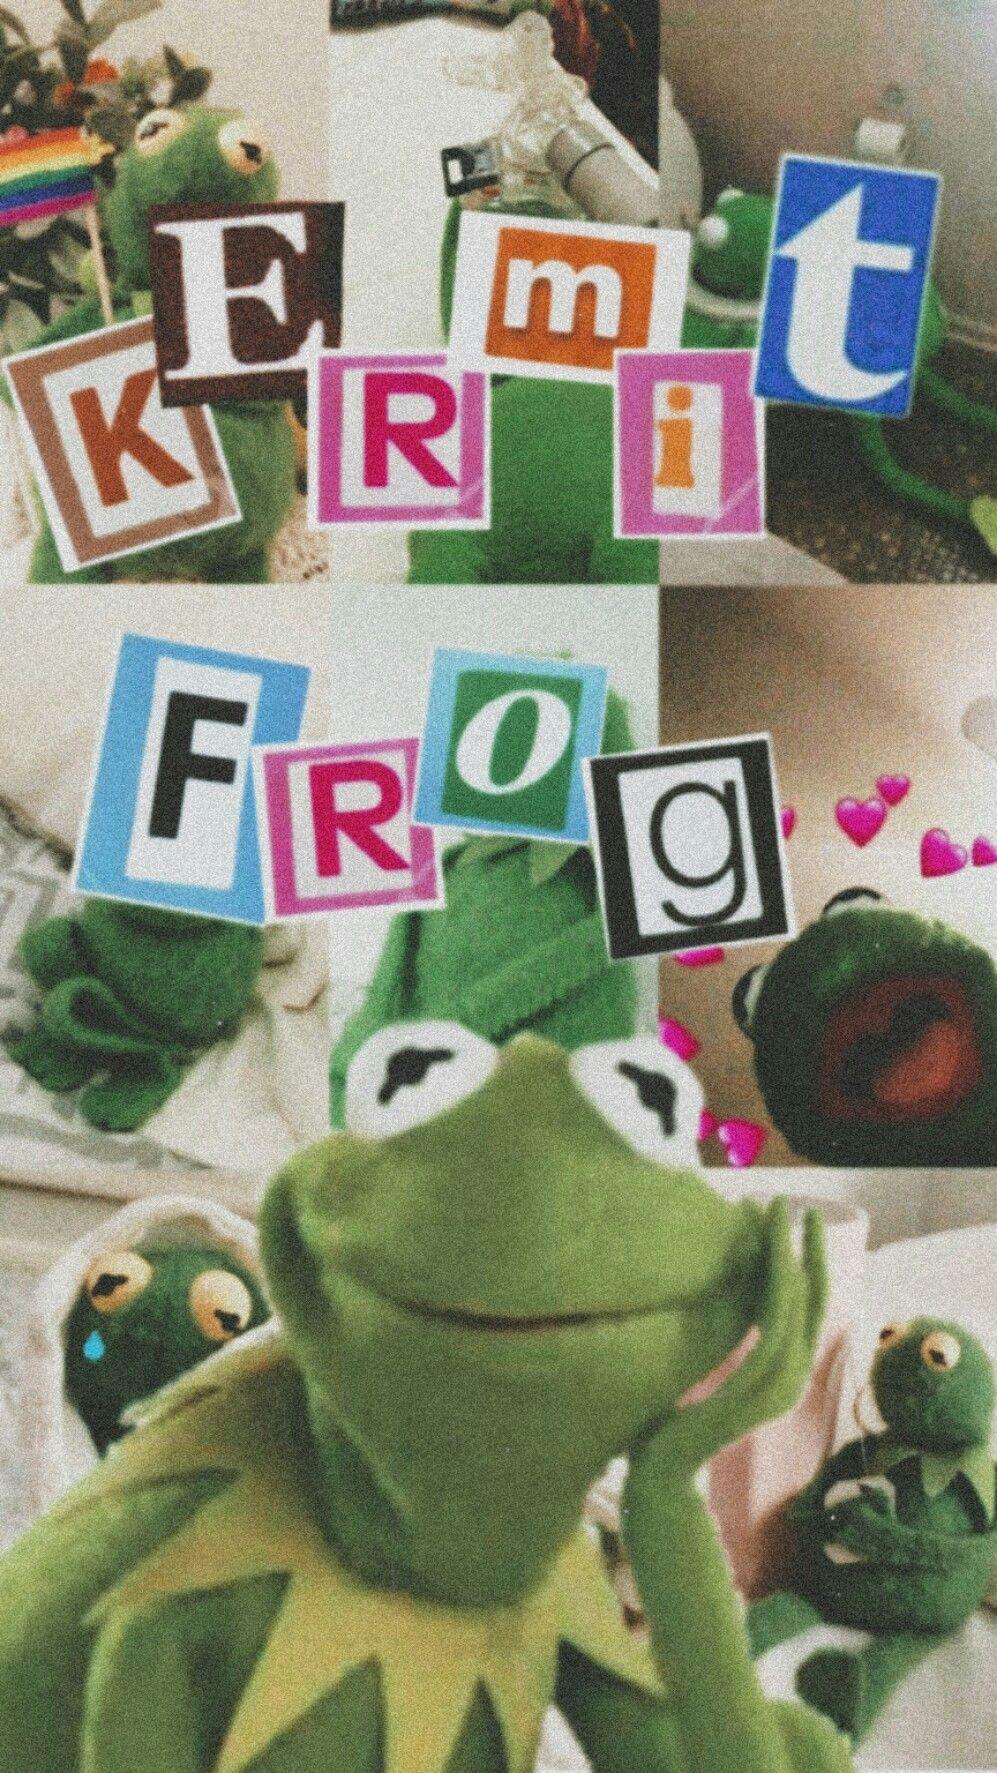 Kermitfrog Aesthetics Edit Editing Frog Wallpaper Cute Tumblr Wallpaper Funny Phone Wallpaper